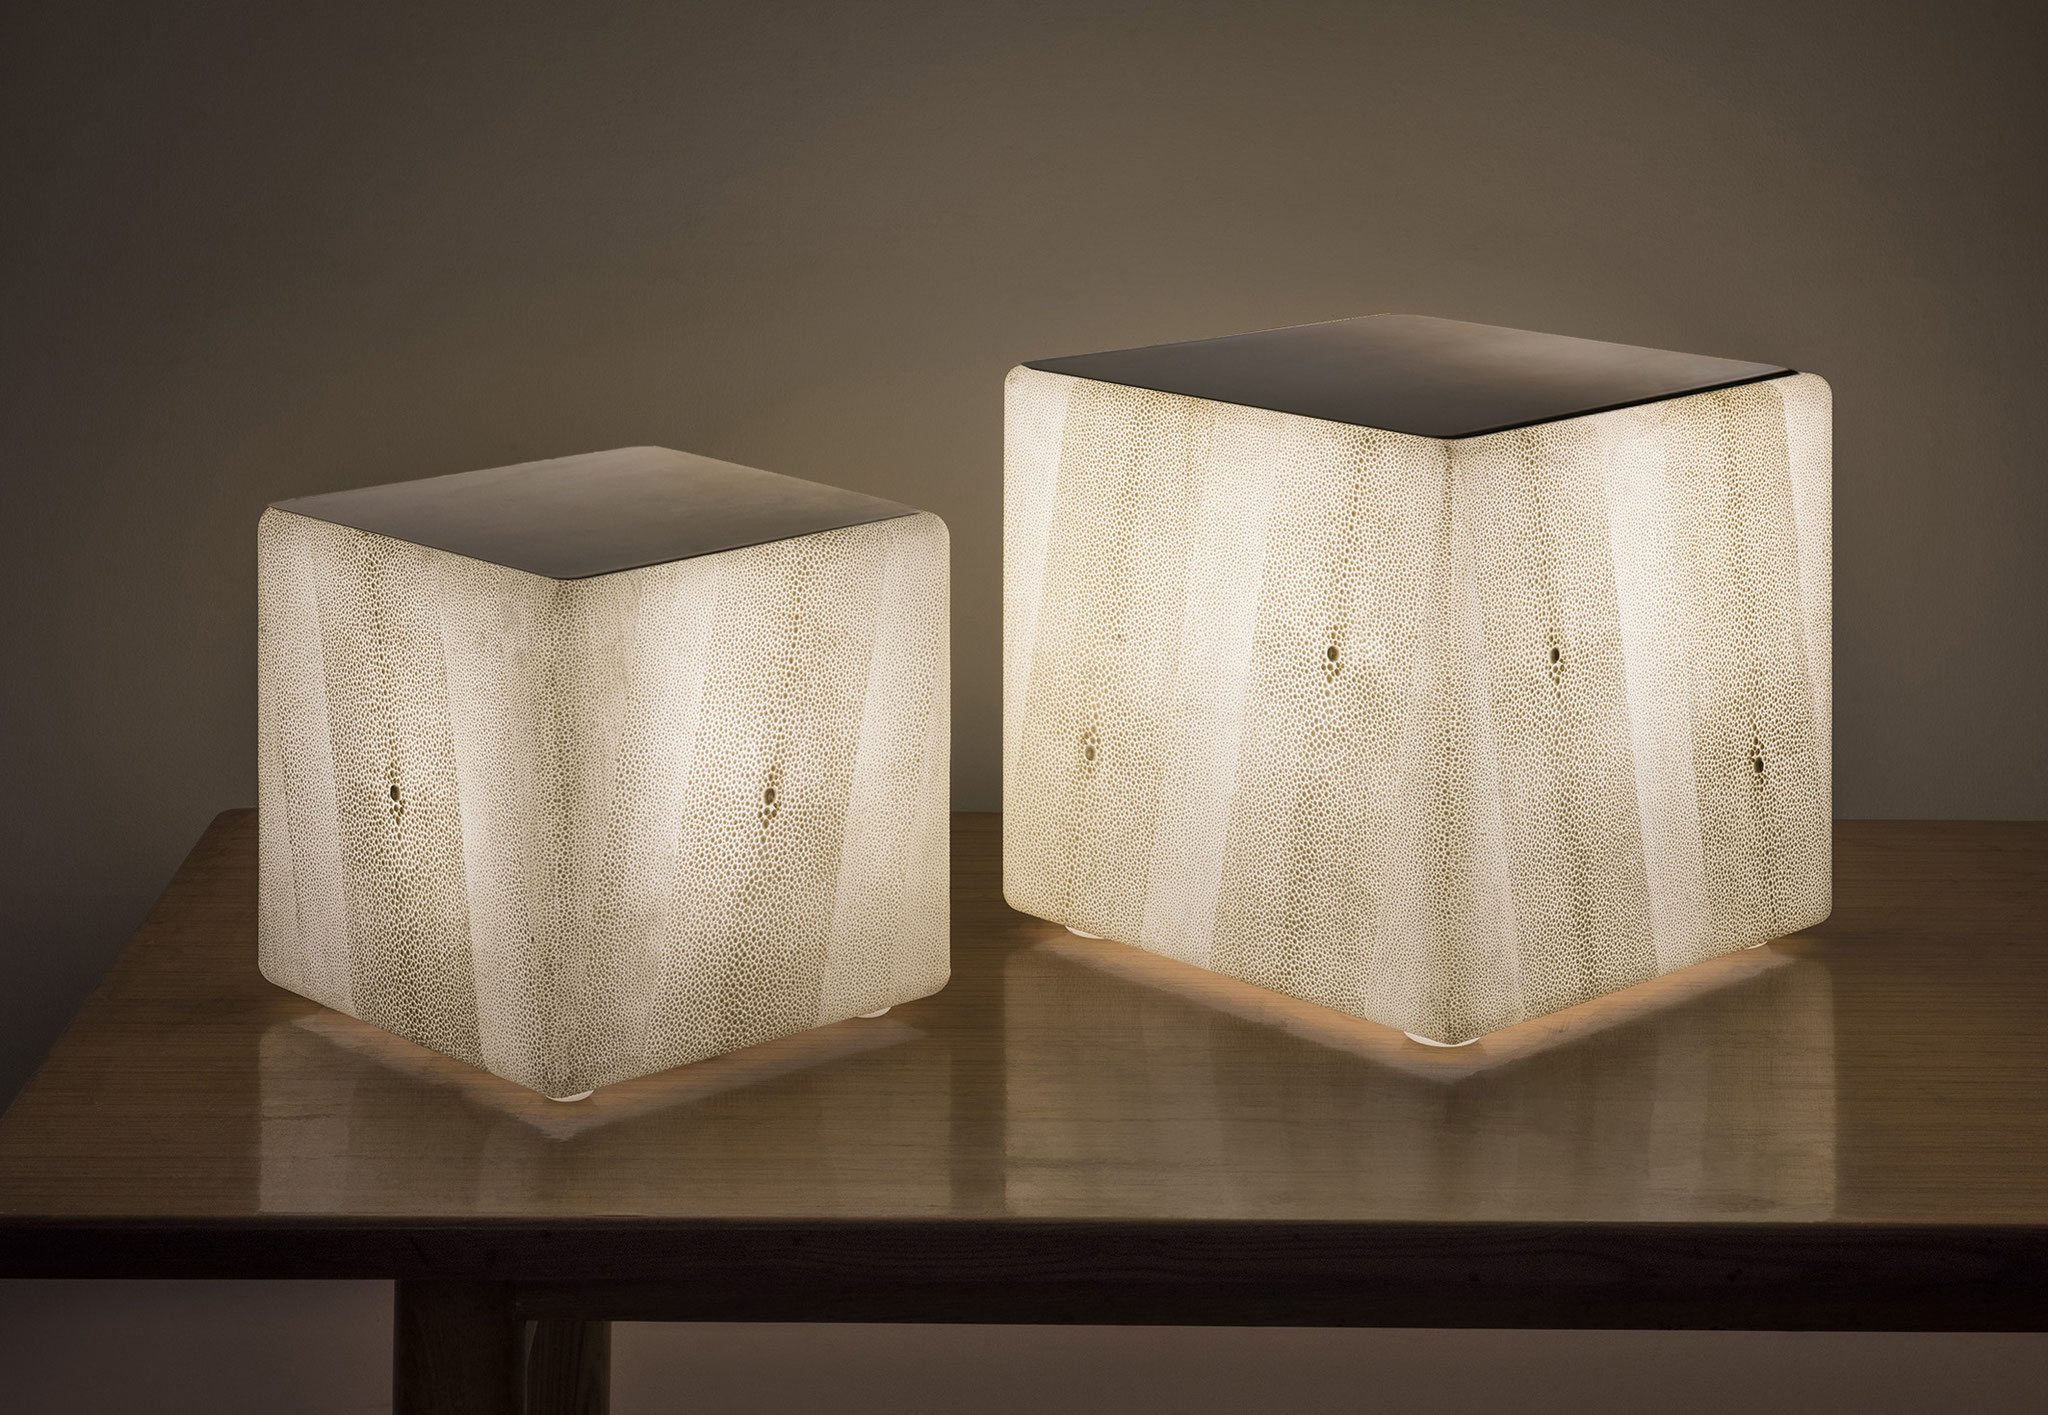 Dimension 20 x 20 x 20 et 25 x 25 x 25 cm with golden brass tray